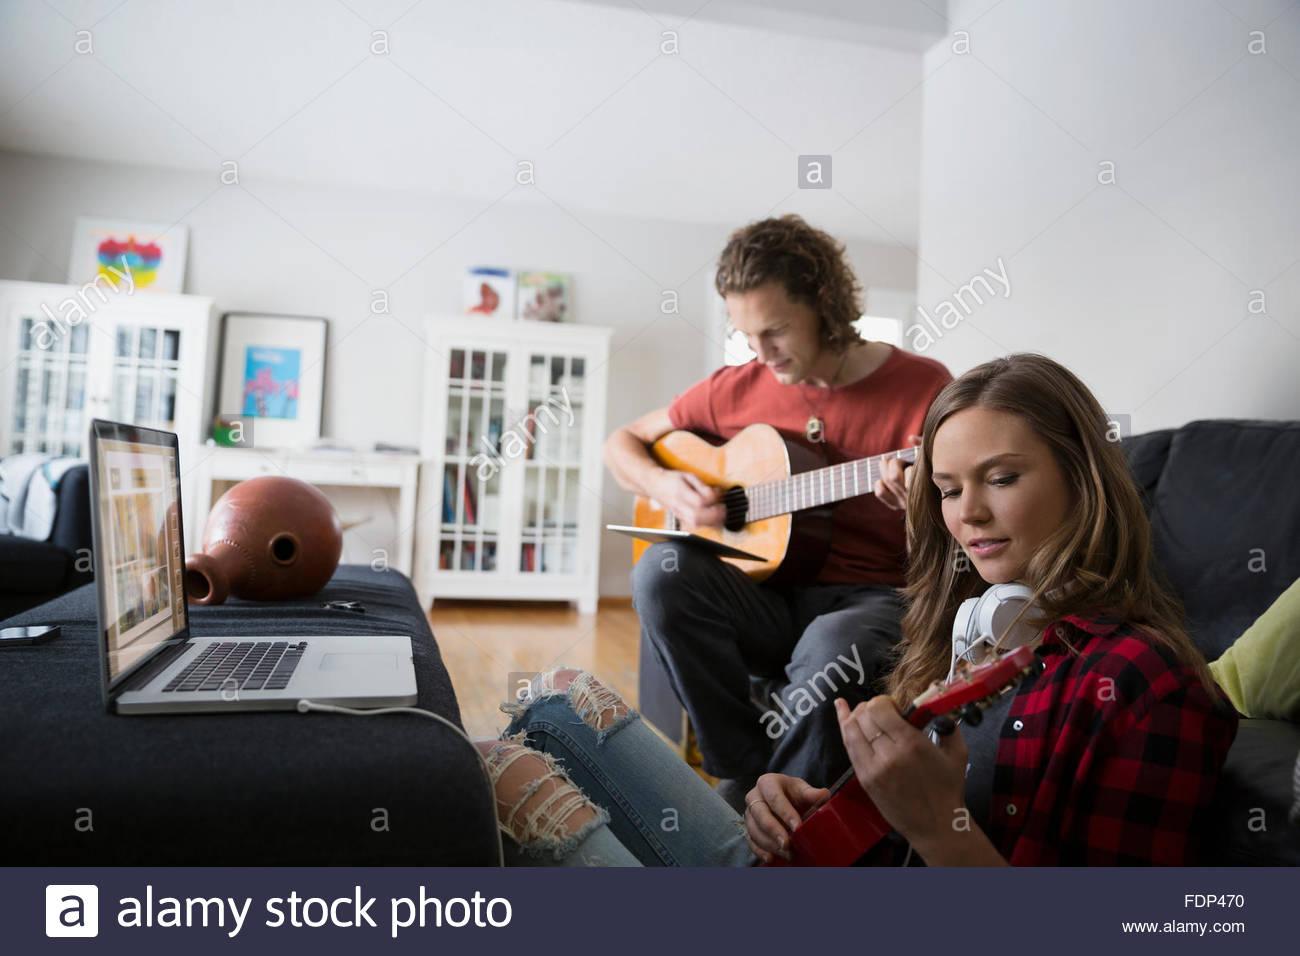 Paar mit Laptop spielen Gitarre und ukulele Stockbild